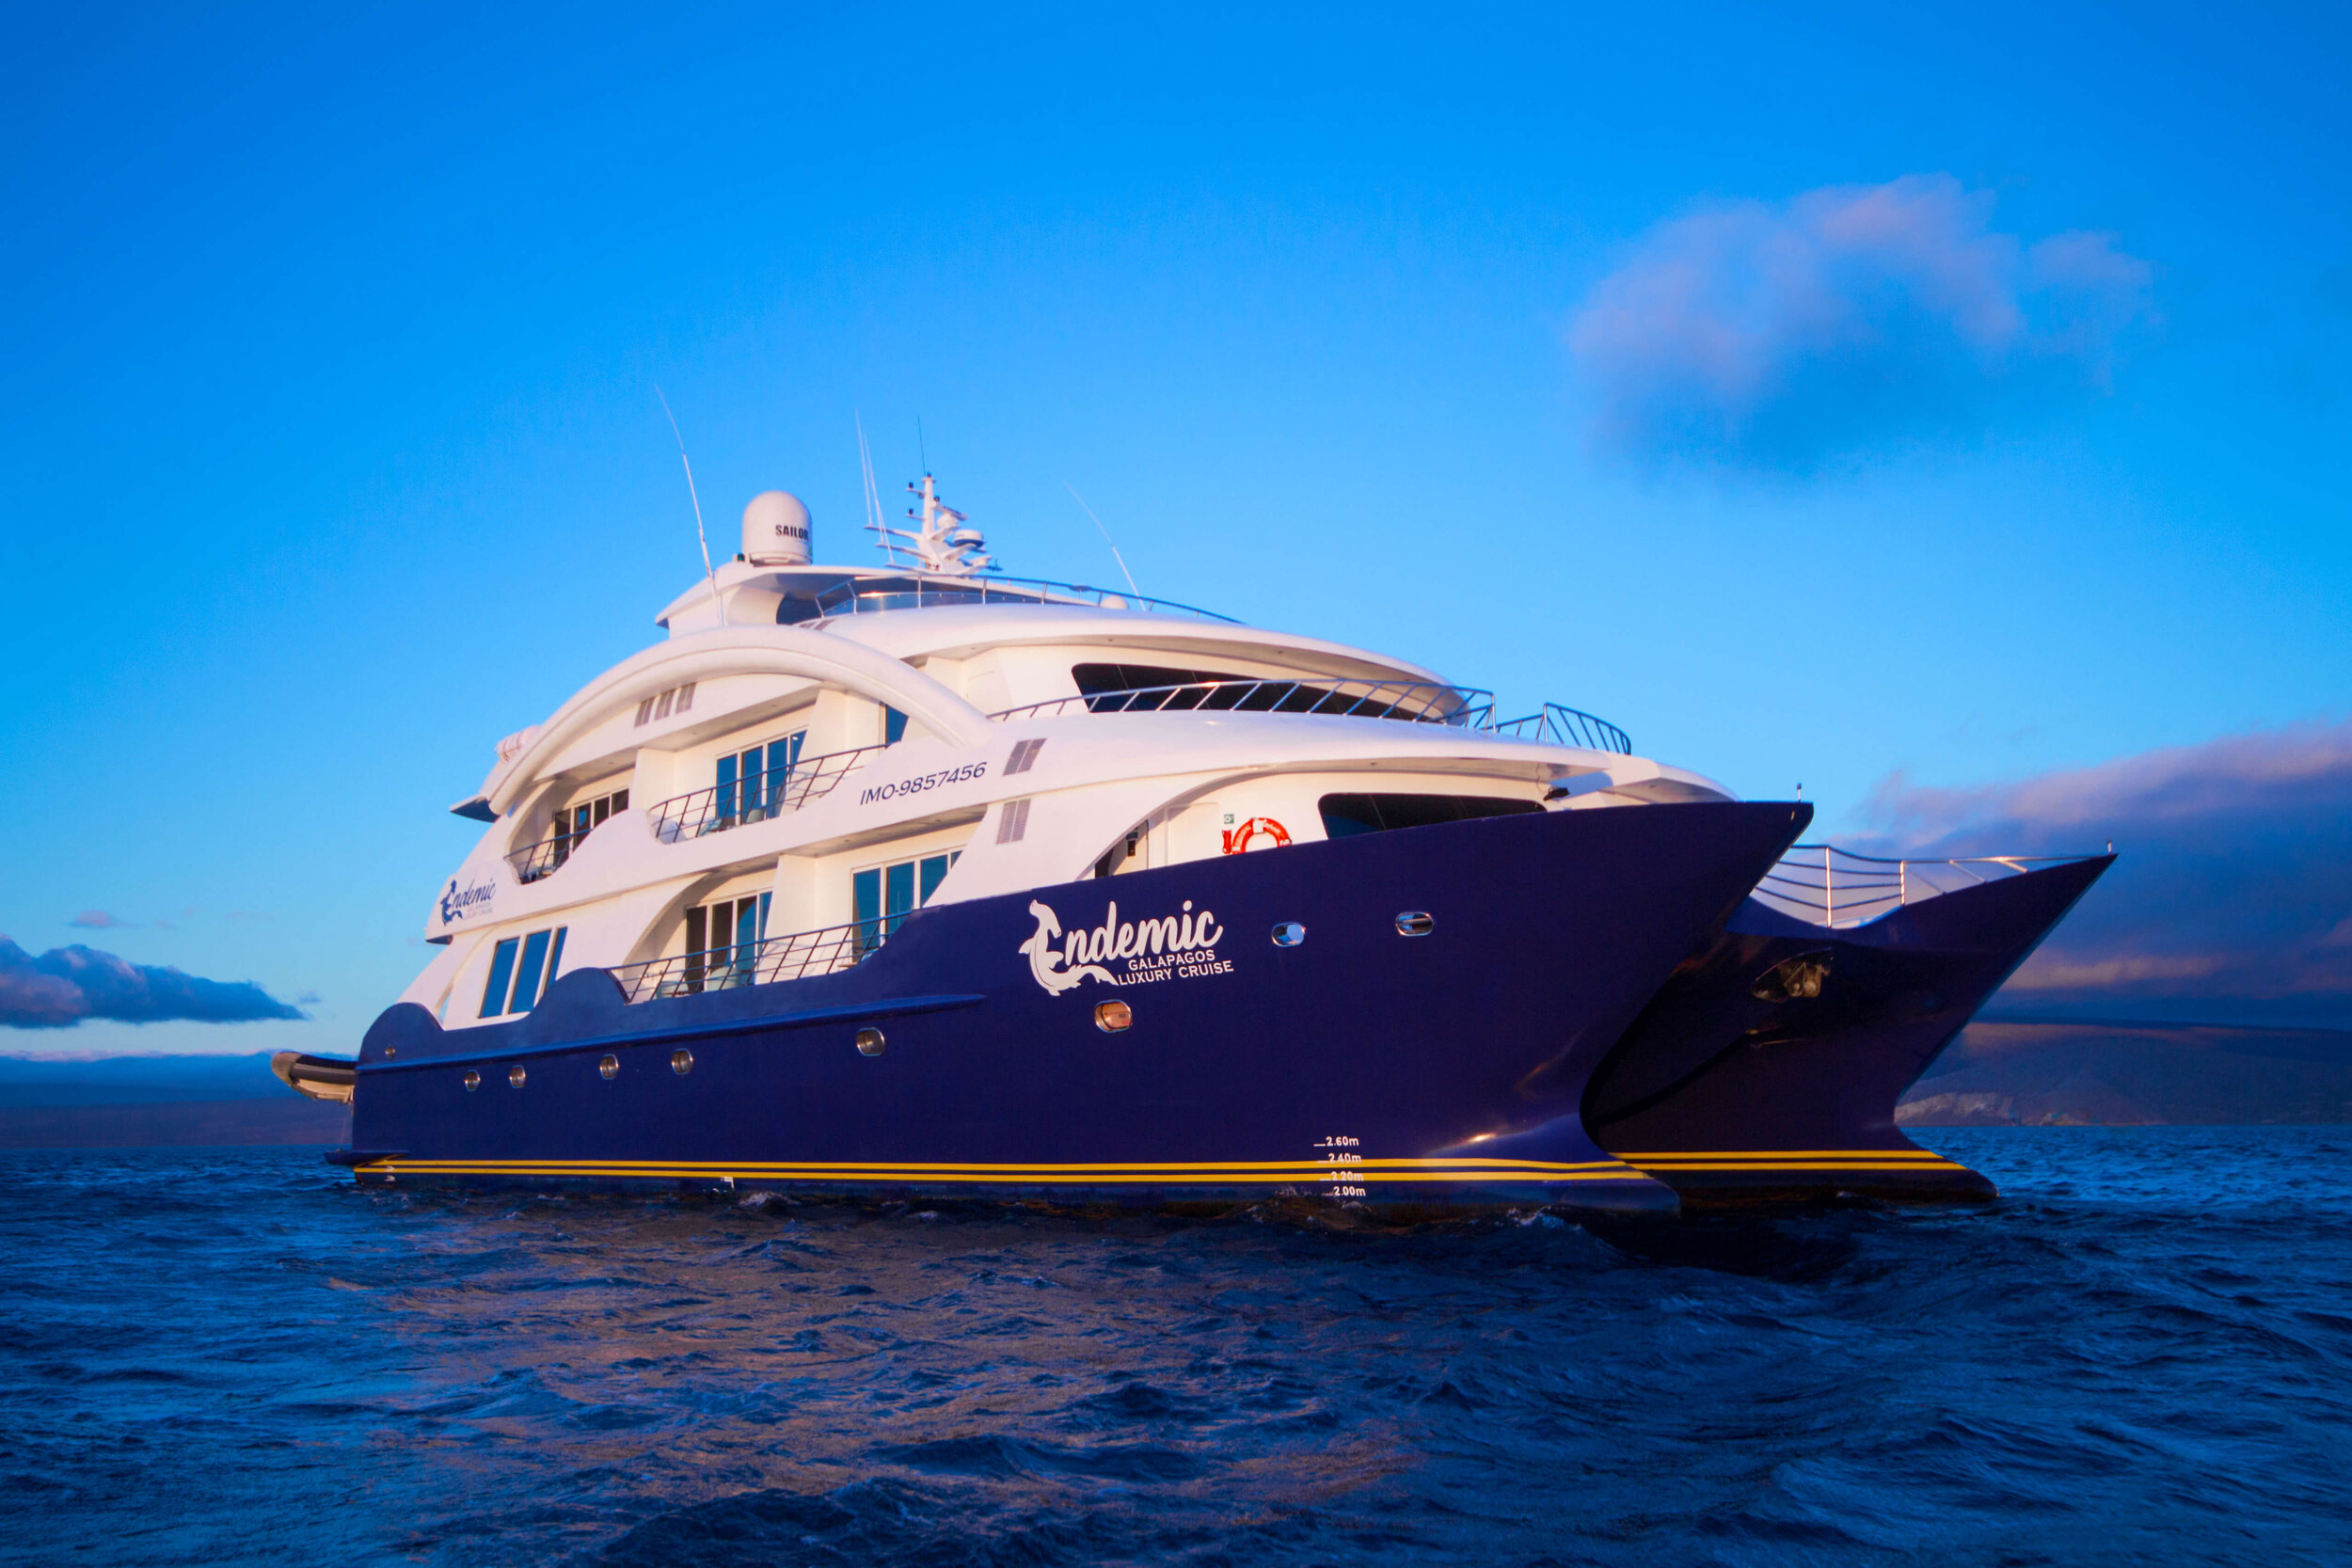 3. Endemic Luxury Catamaran - F7.jpg